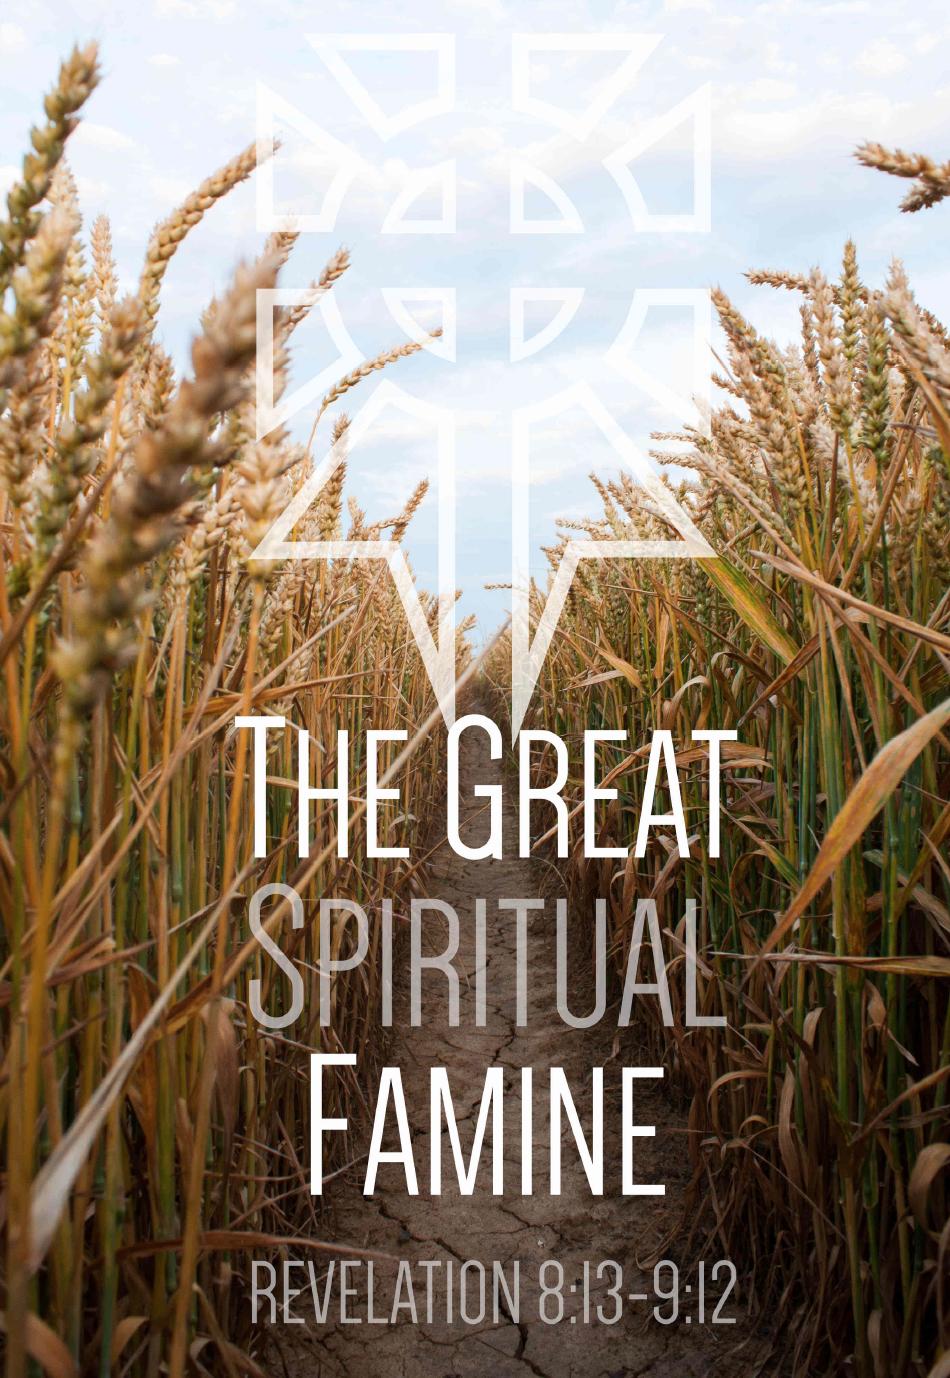 The Great Spiritual Famine